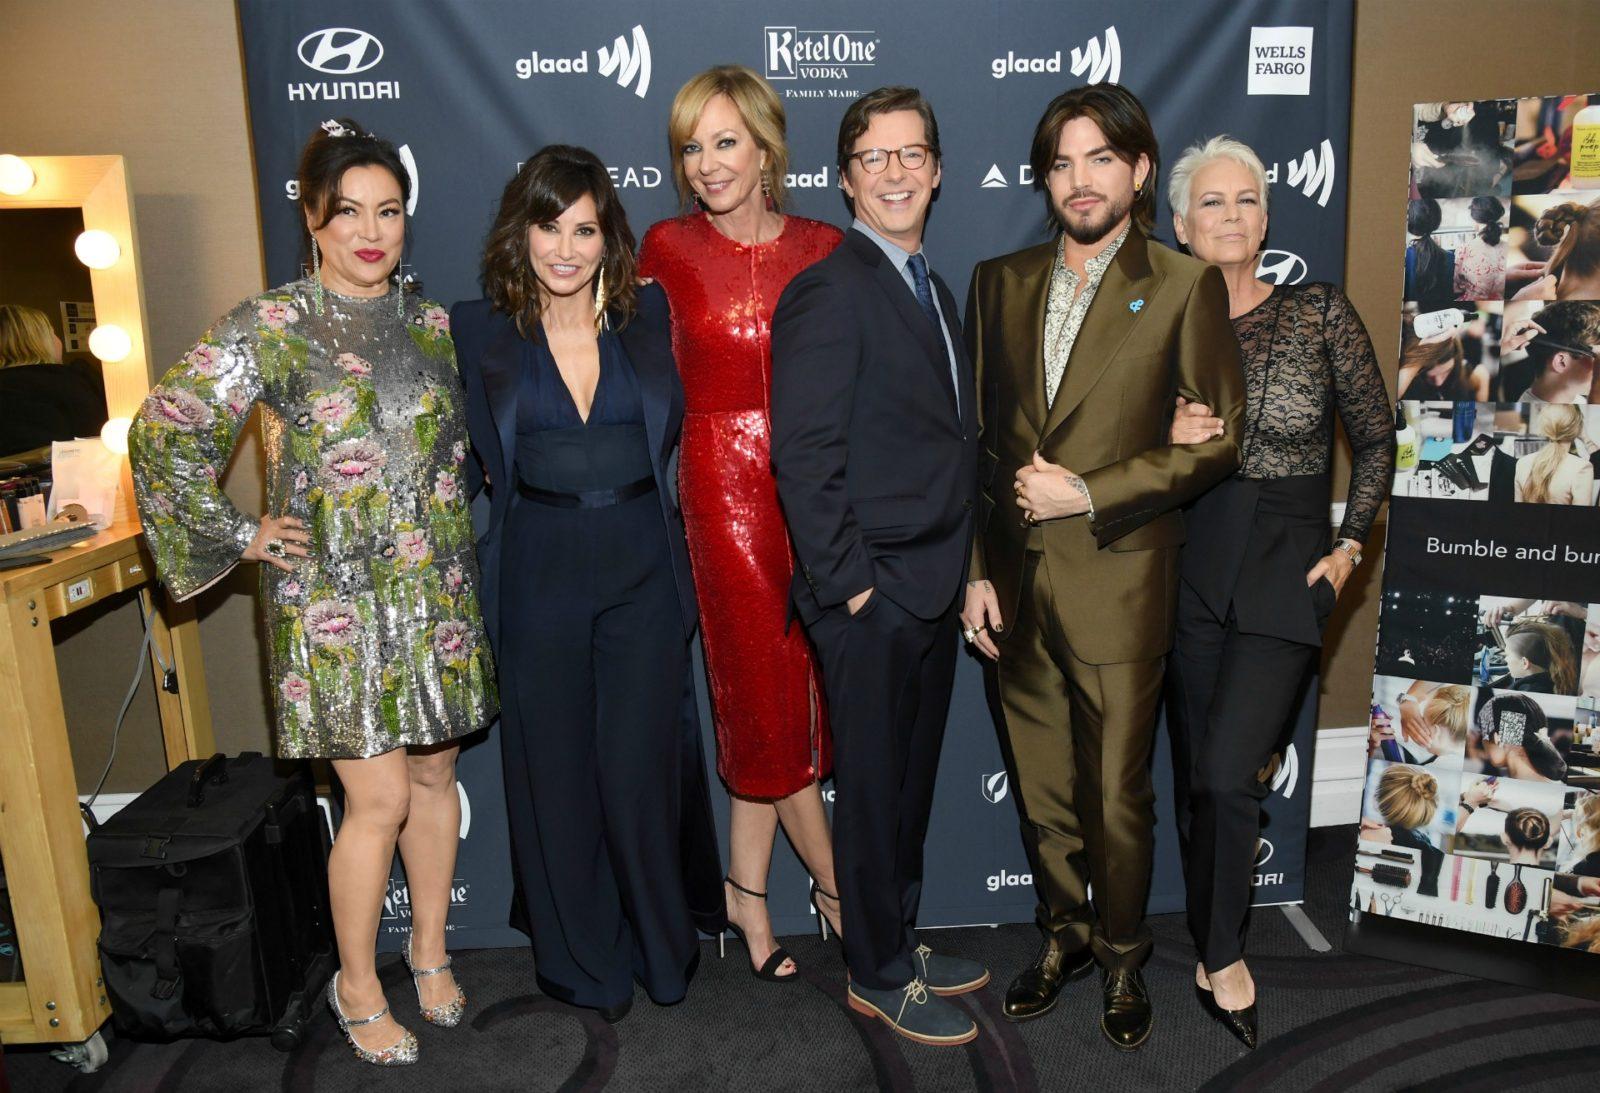 Jennifer Tilly, Gina Gershon, Allison Janney, Sean Hayes, Adam Lambert, and Jamie Lee Curtis pose together.